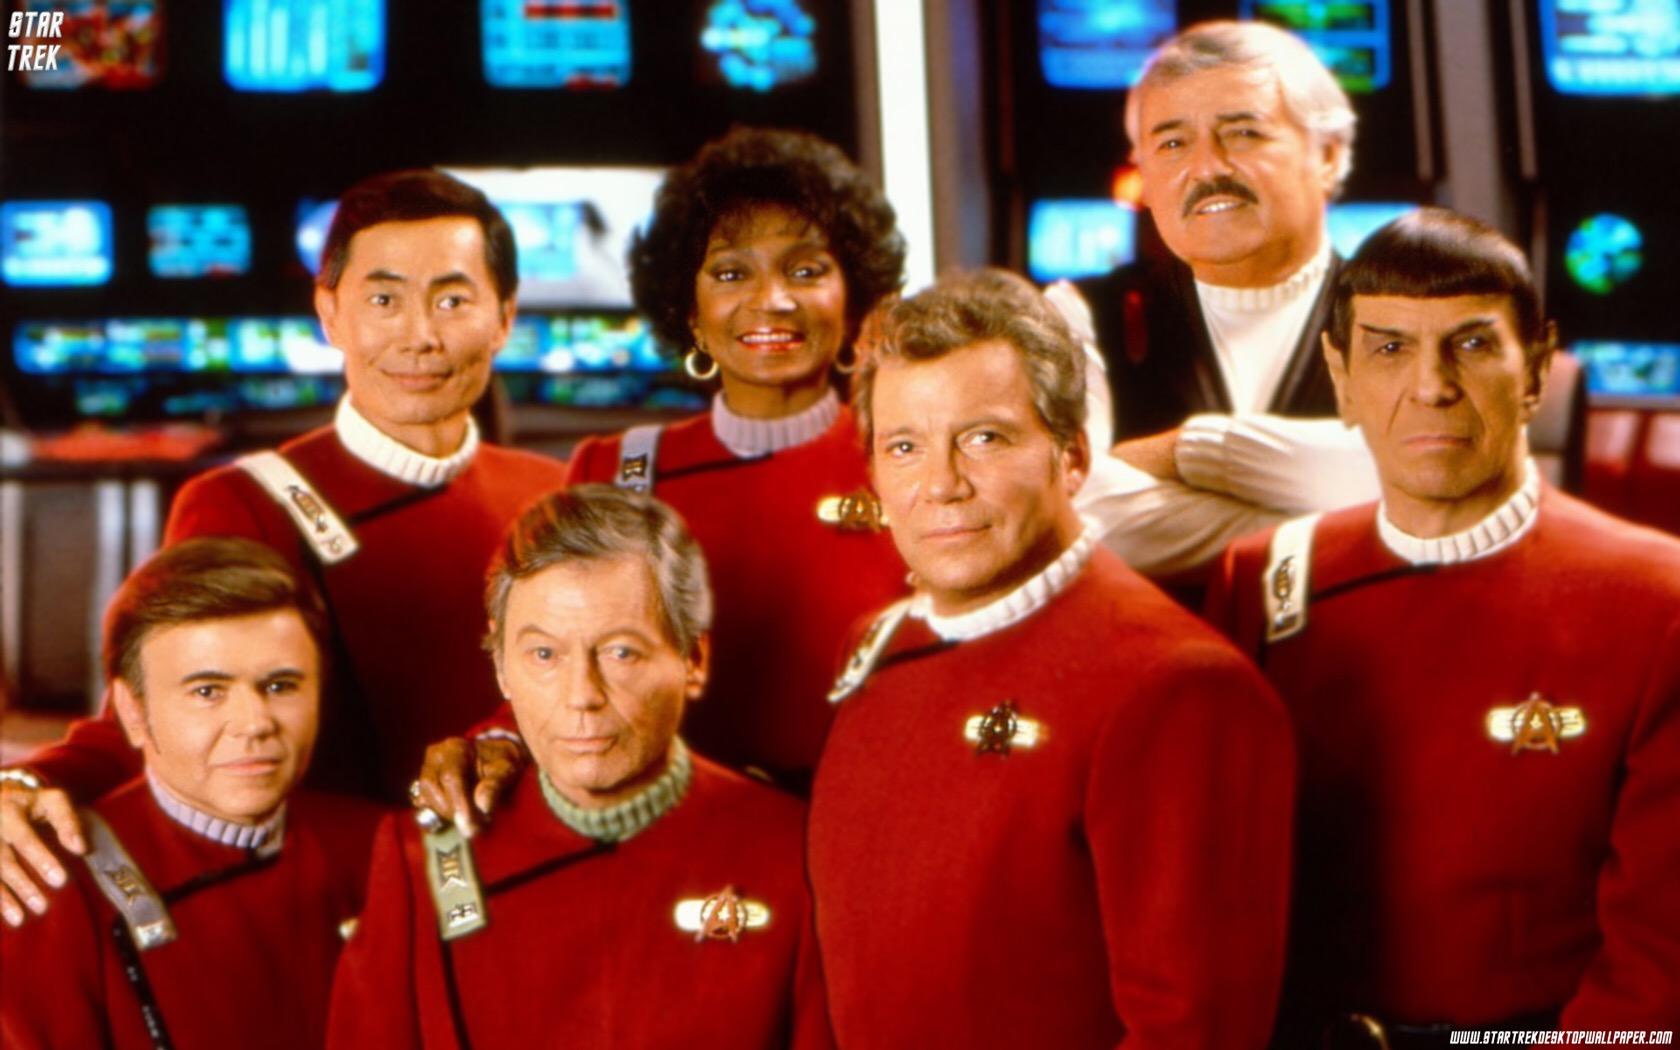 Cineclube Sci Fi CJRJ – Star Trek VI – The Undiscovered Country